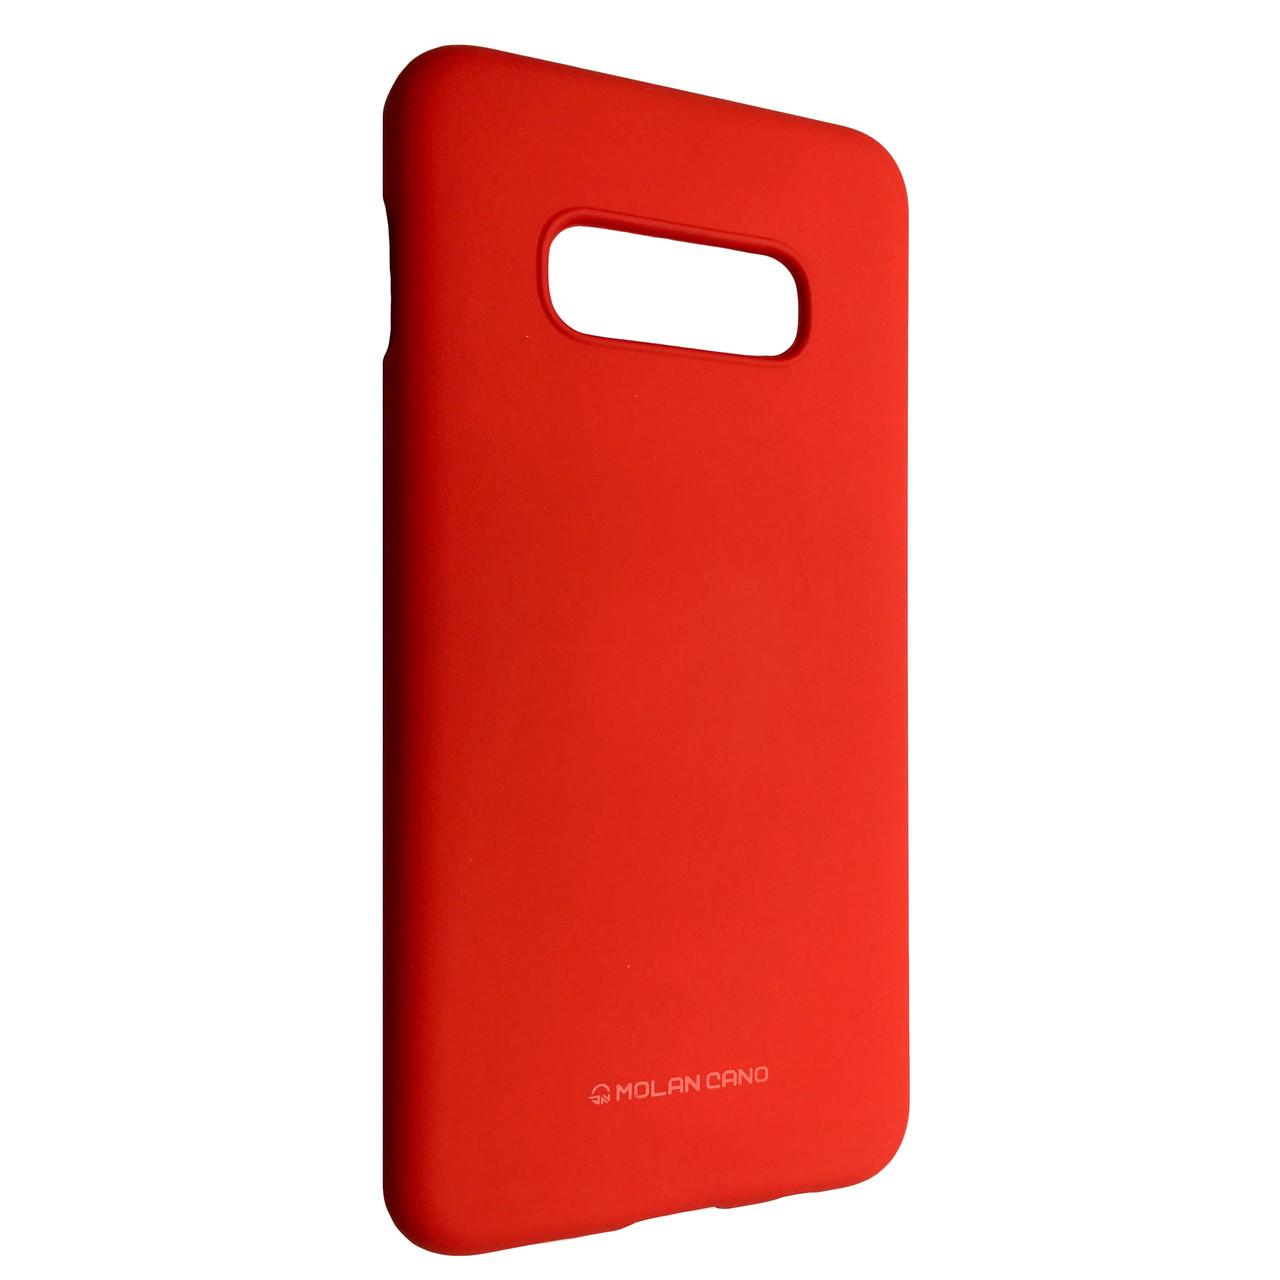 Чехол Hana Molan Cano Samsung S10e (red)